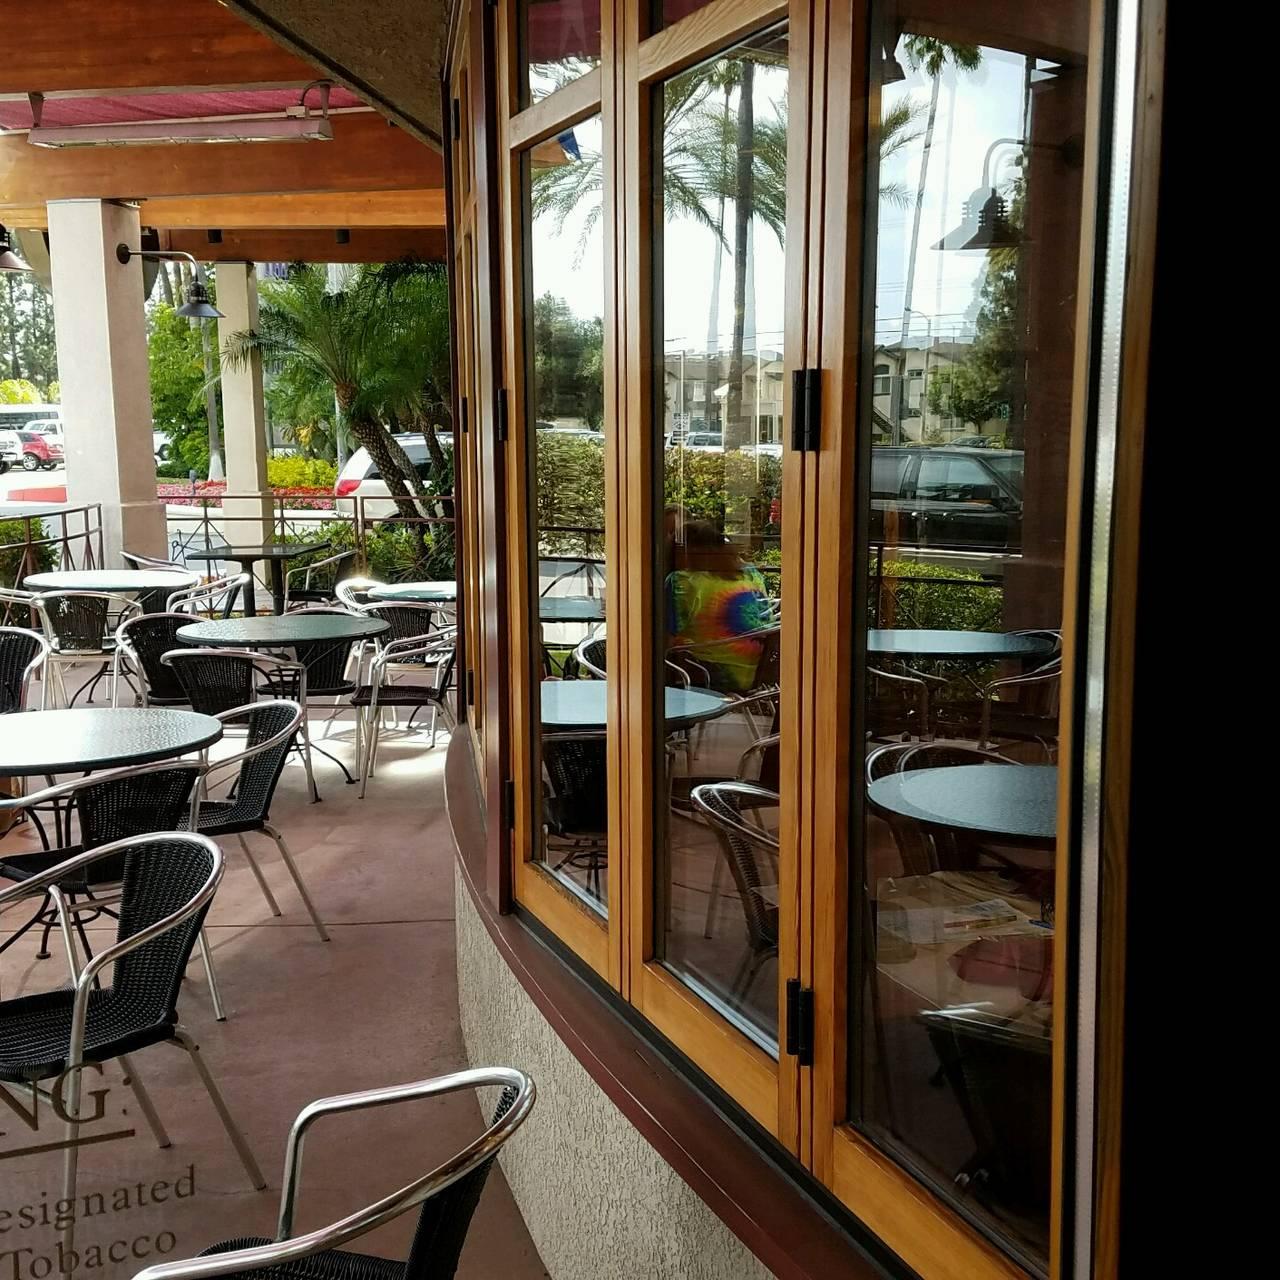 Amber Waves Restaurant - Buena Park, CA | OpenTable